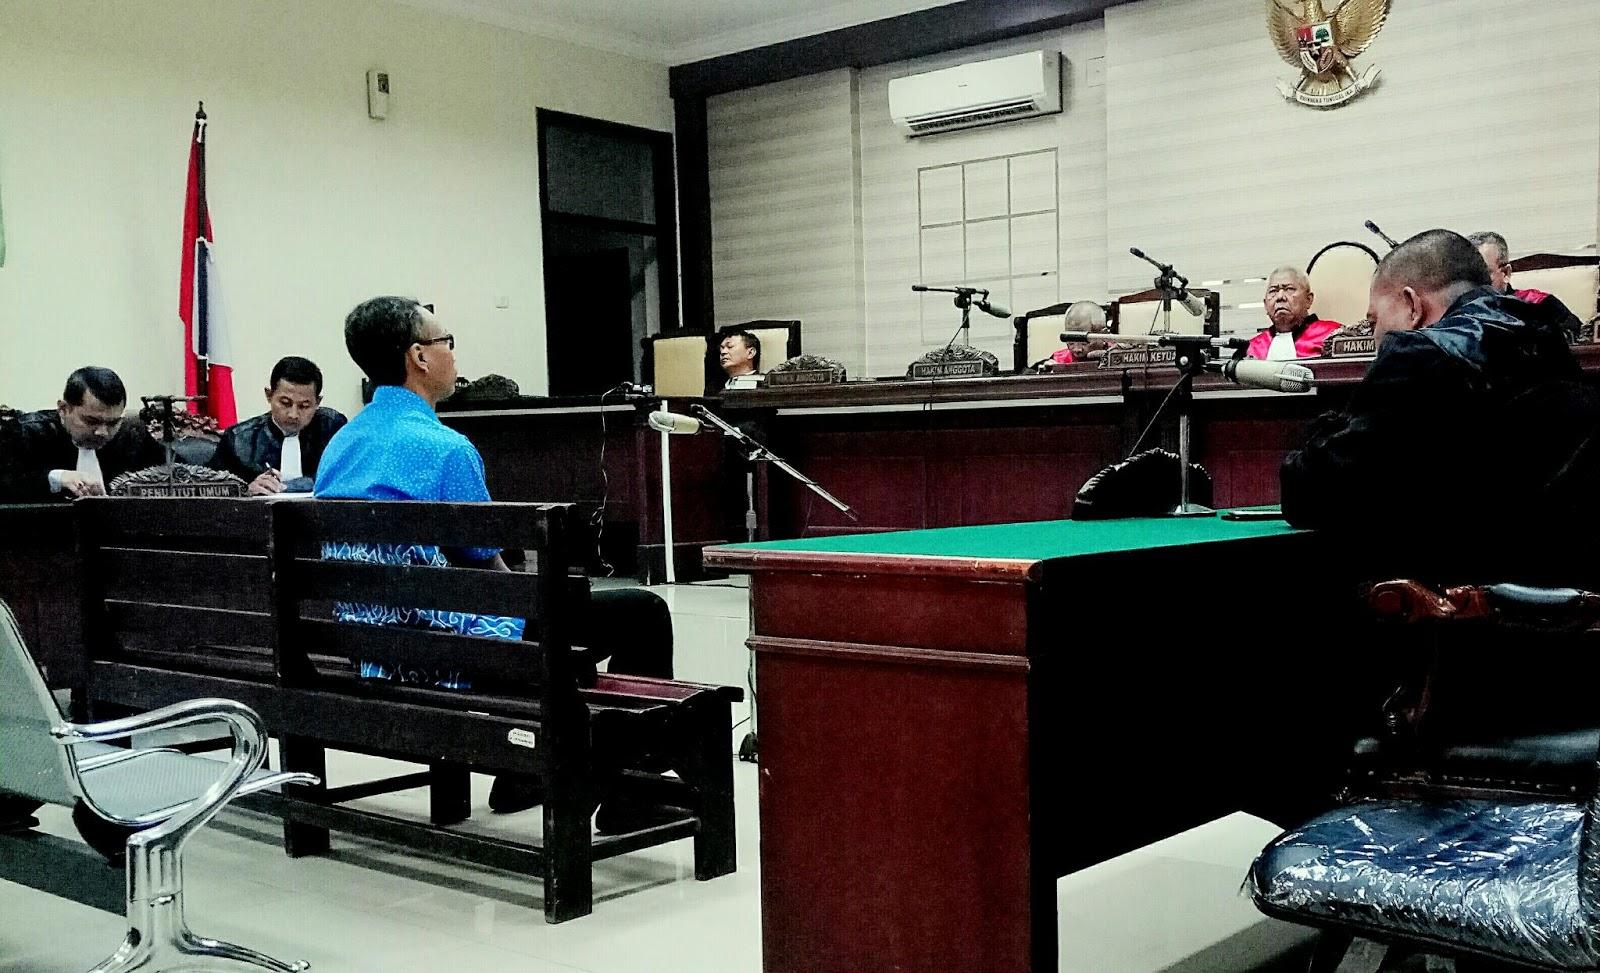 Sidang Ke 18 Kasus Ott Dugaan Suap Proyek Pens Terdakwa Wiwiet  # Muebles Coarte Manta